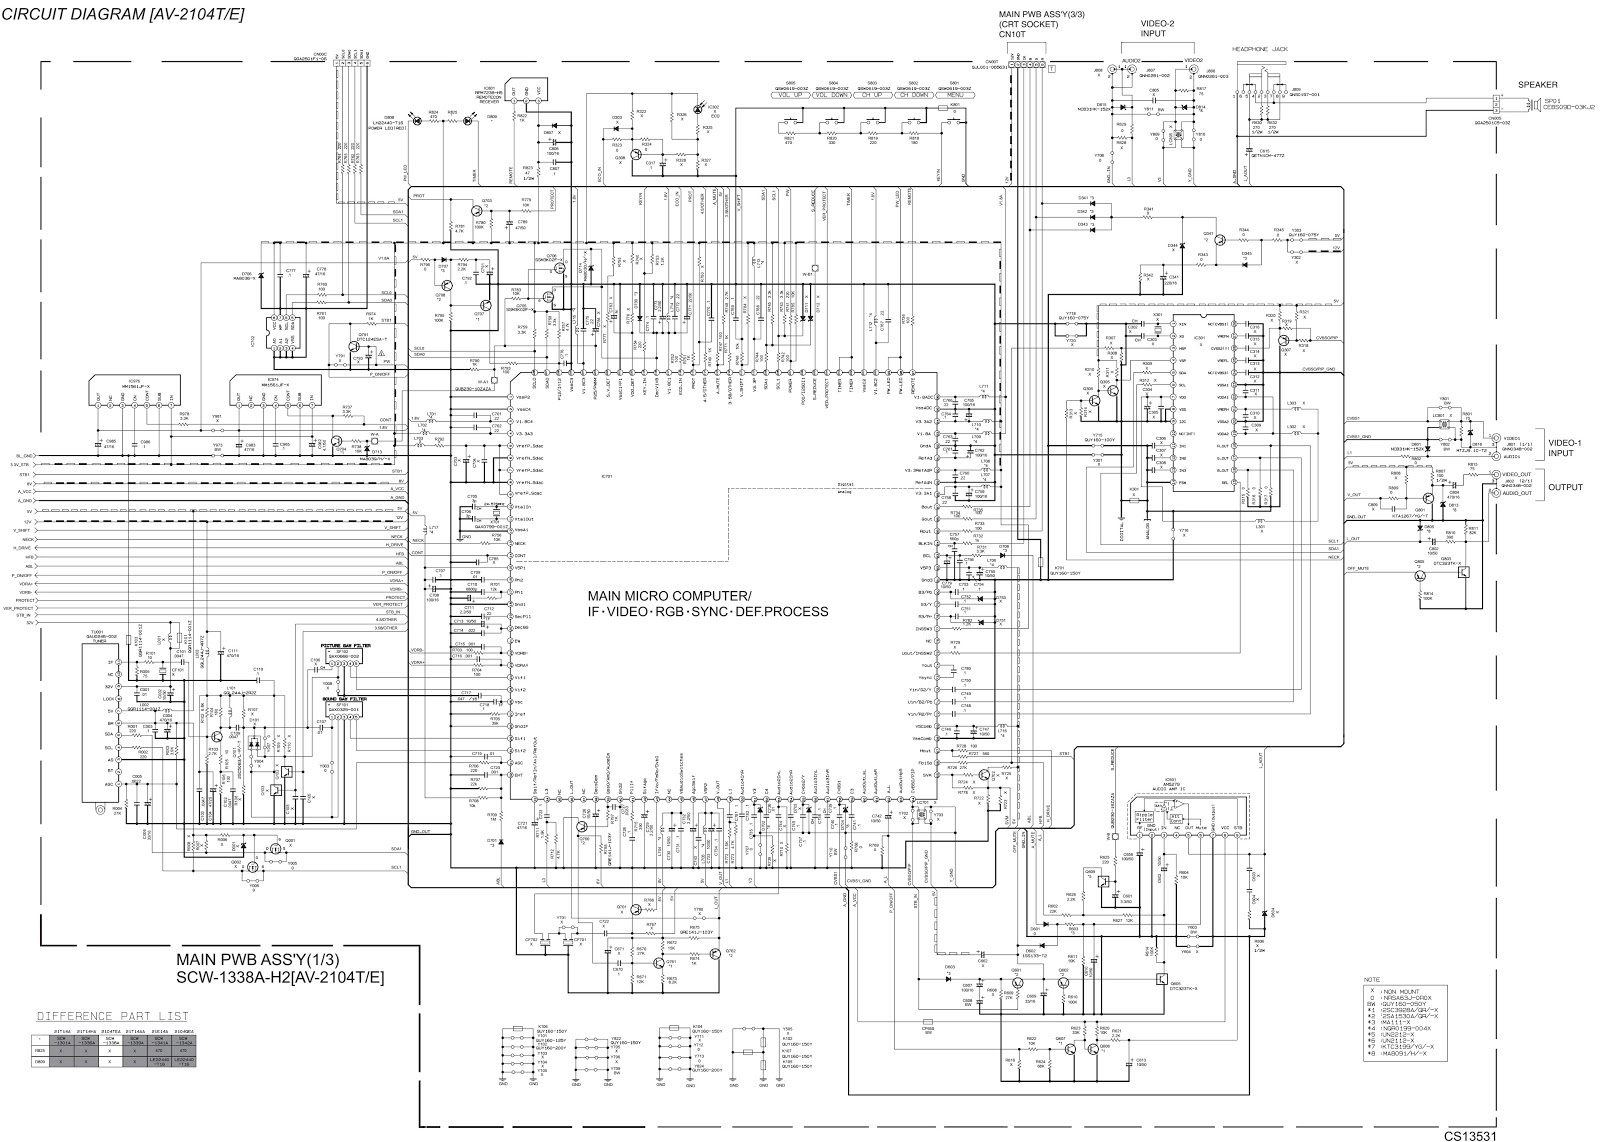 small resolution of jvc av21tmg4 u2013 jvc av2104t u2013 crt tv u2013 circuit diagram u2013